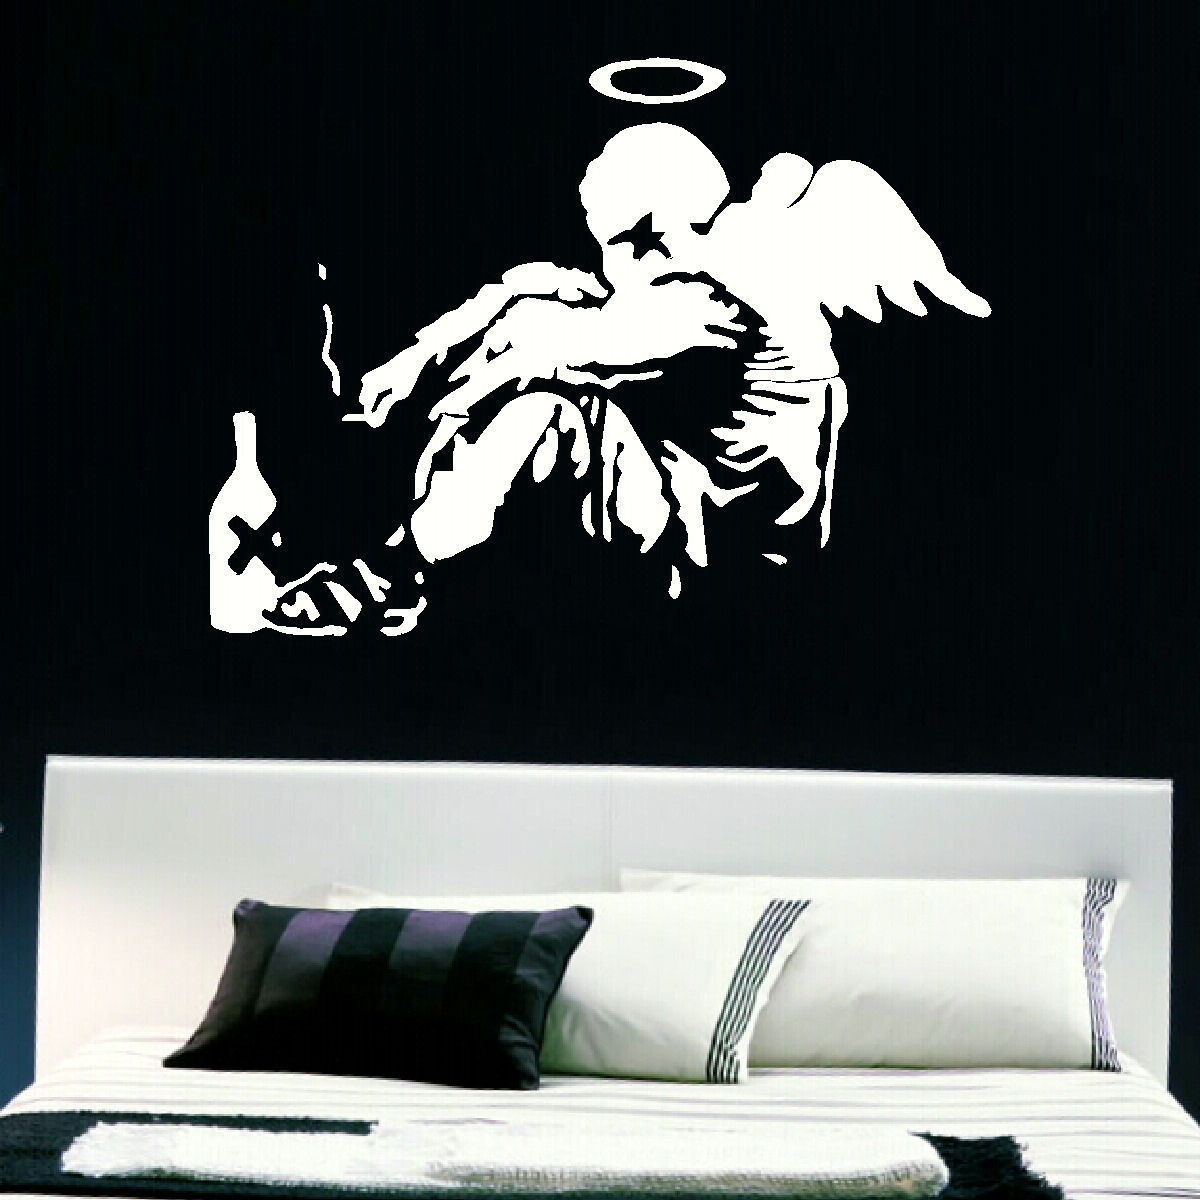 Large wall art banksy fallen angel sticker transfer giant mural uk giant mural uk post banksy amipublicfo Gallery